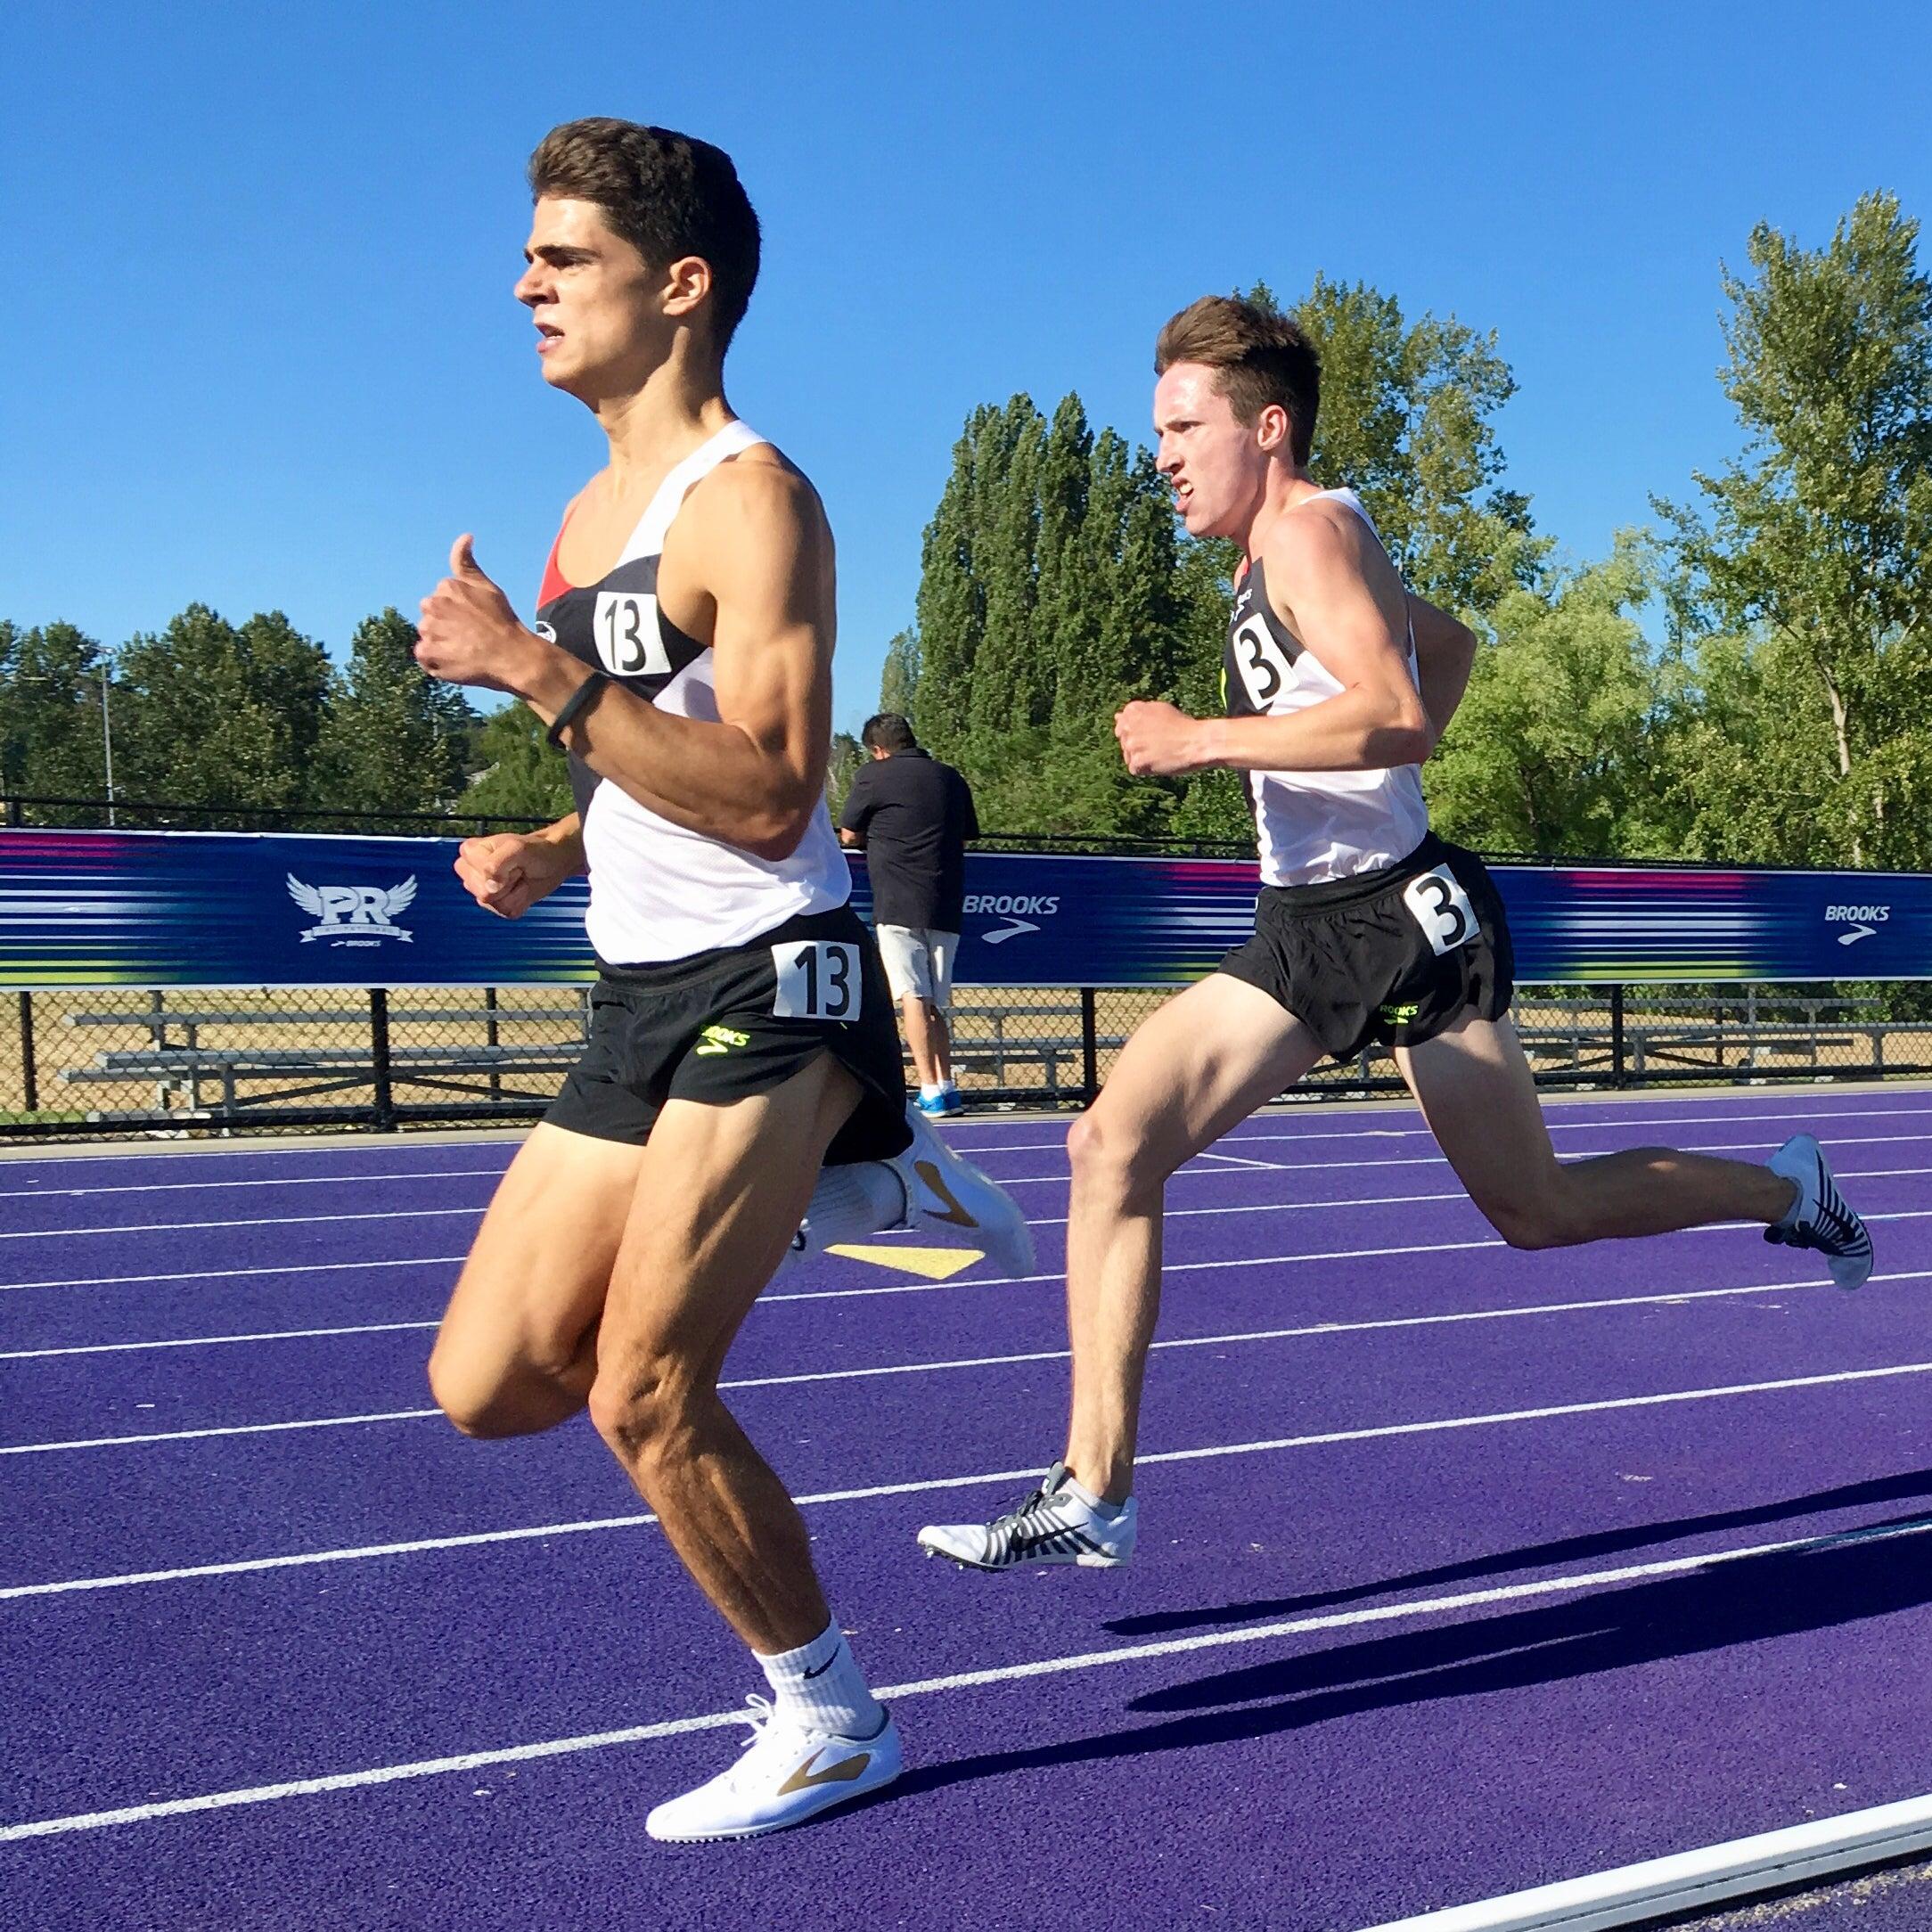 Nick Foster leading mile, Brooks PR